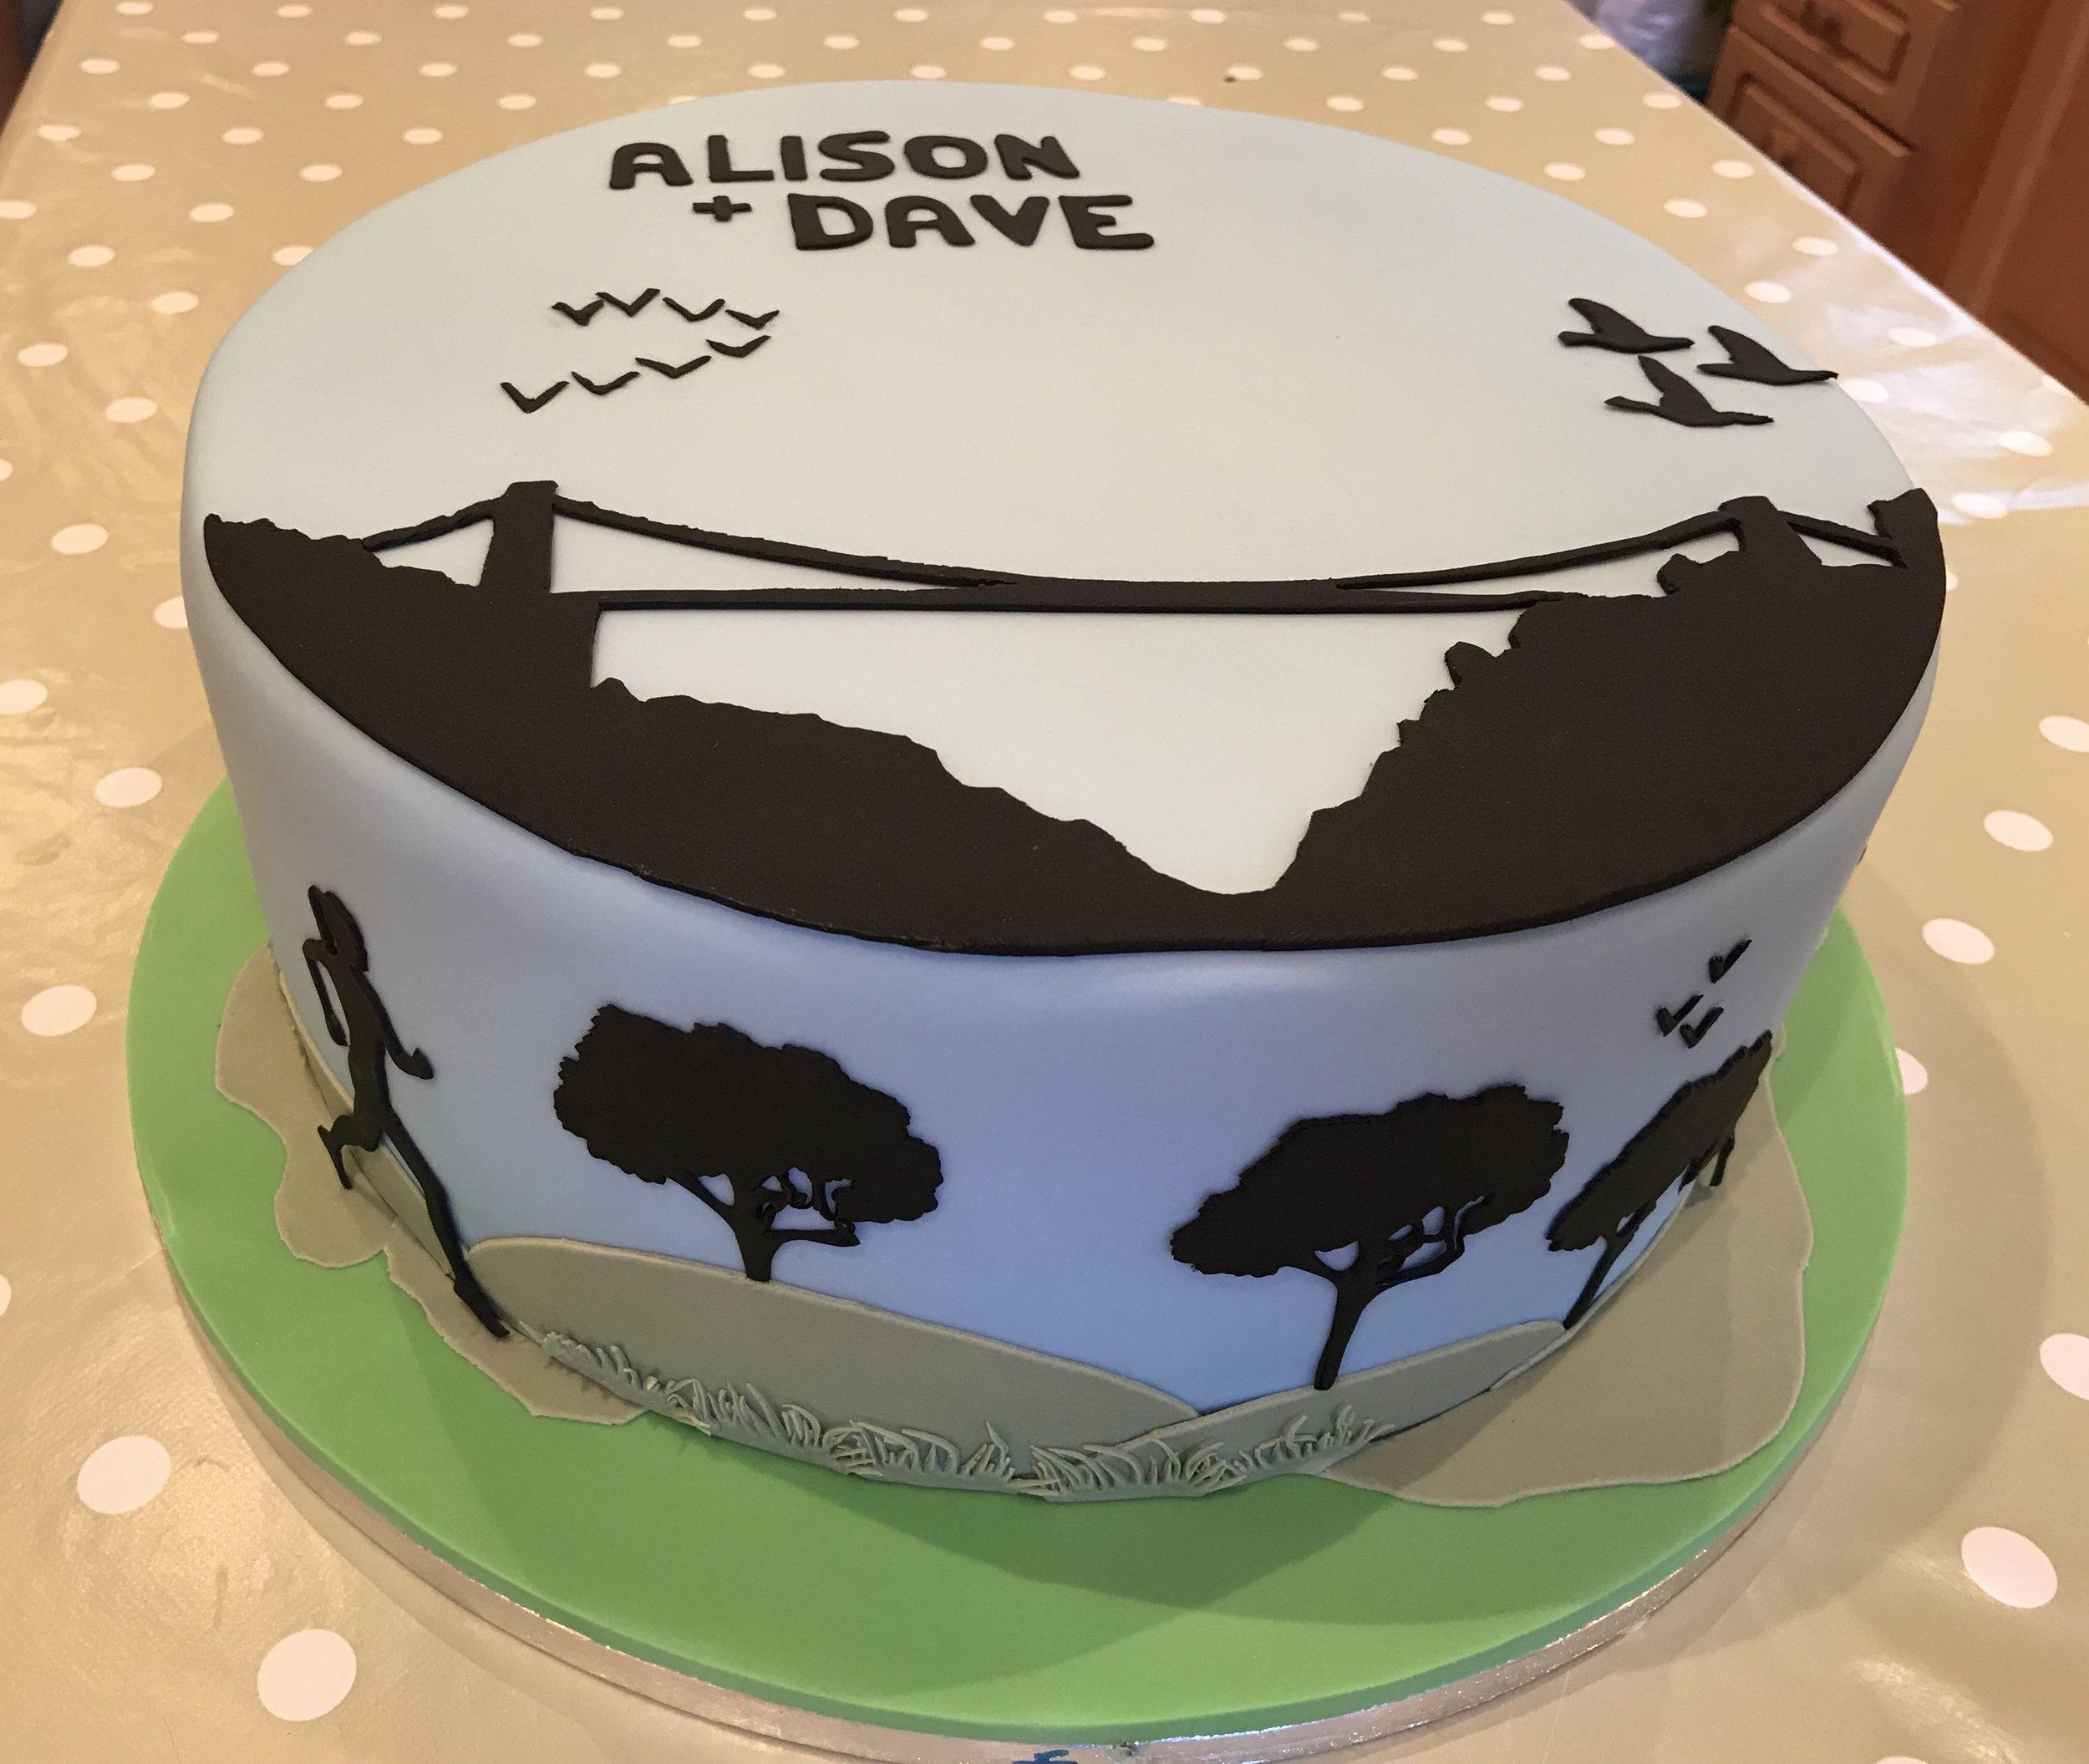 Silhouette running cake, with Bristol suspension bridge.